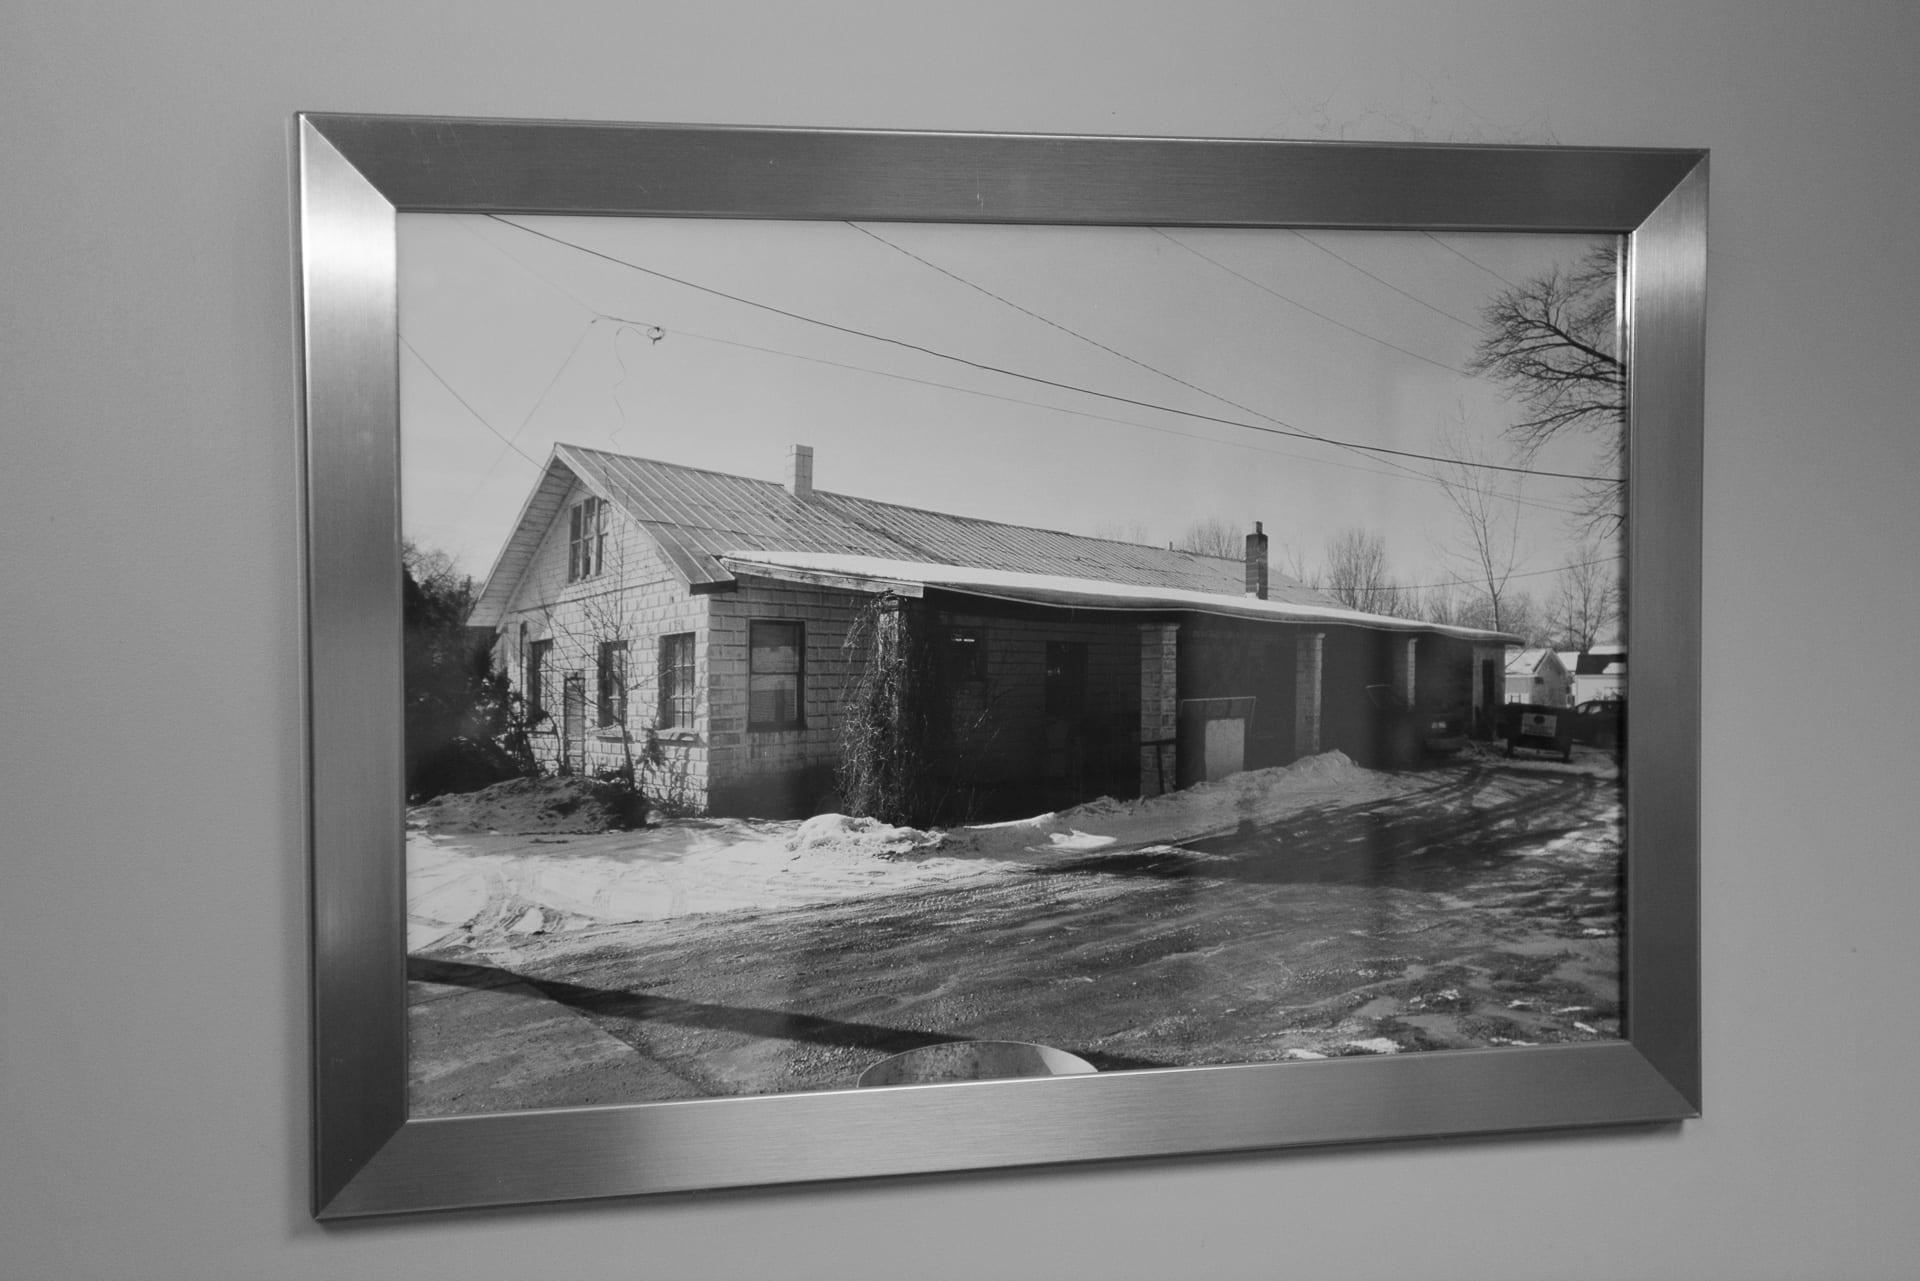 Original Metal Cutting and Welding Building